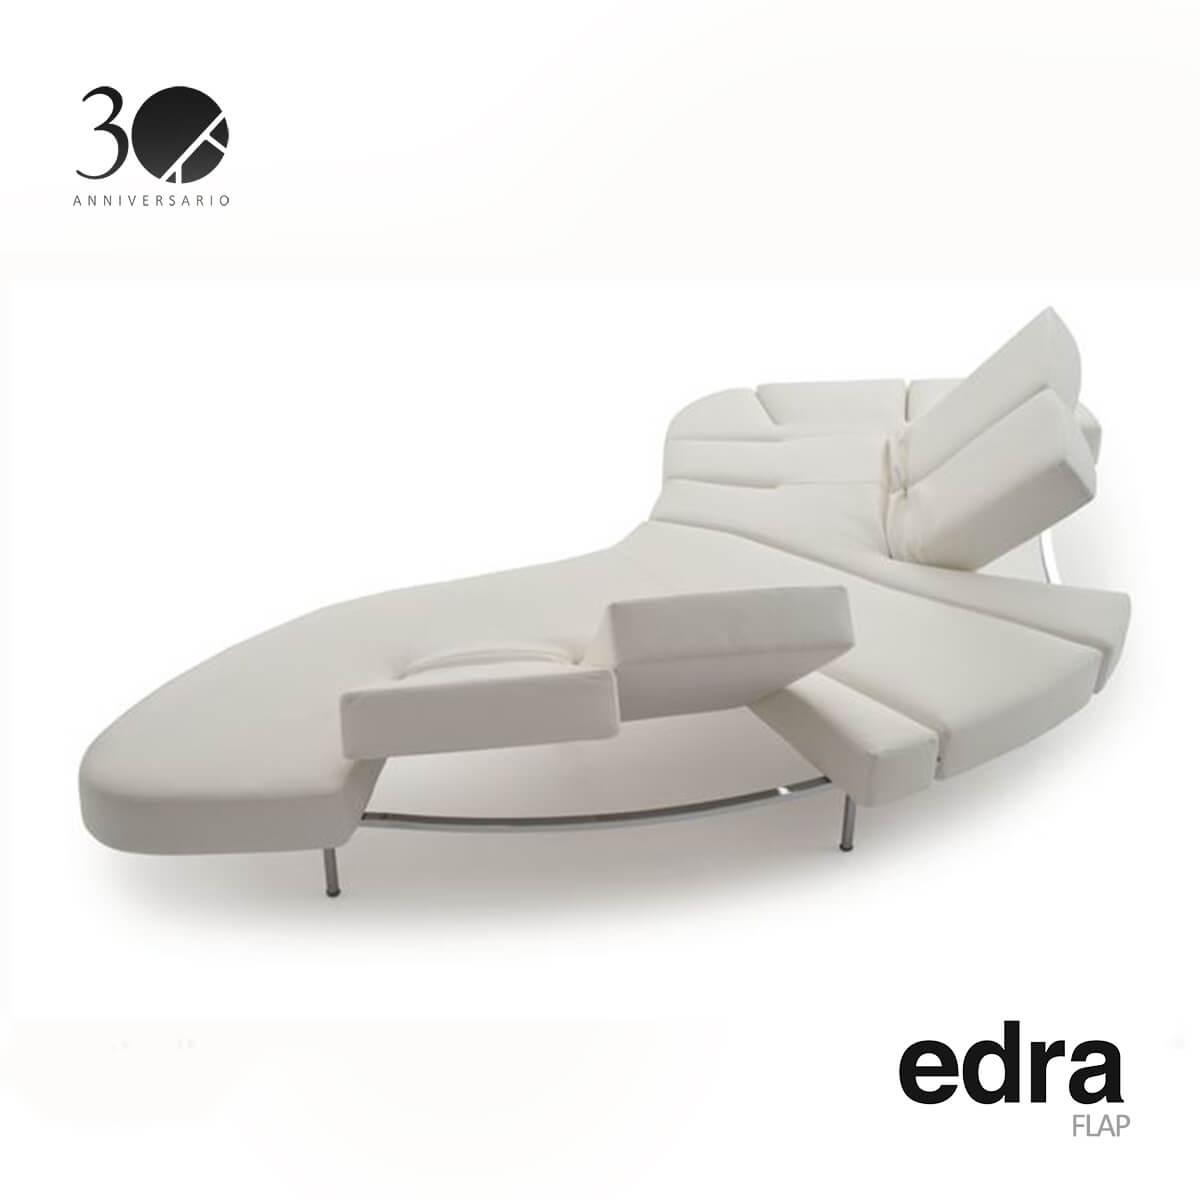 EDRA-FLAP-1